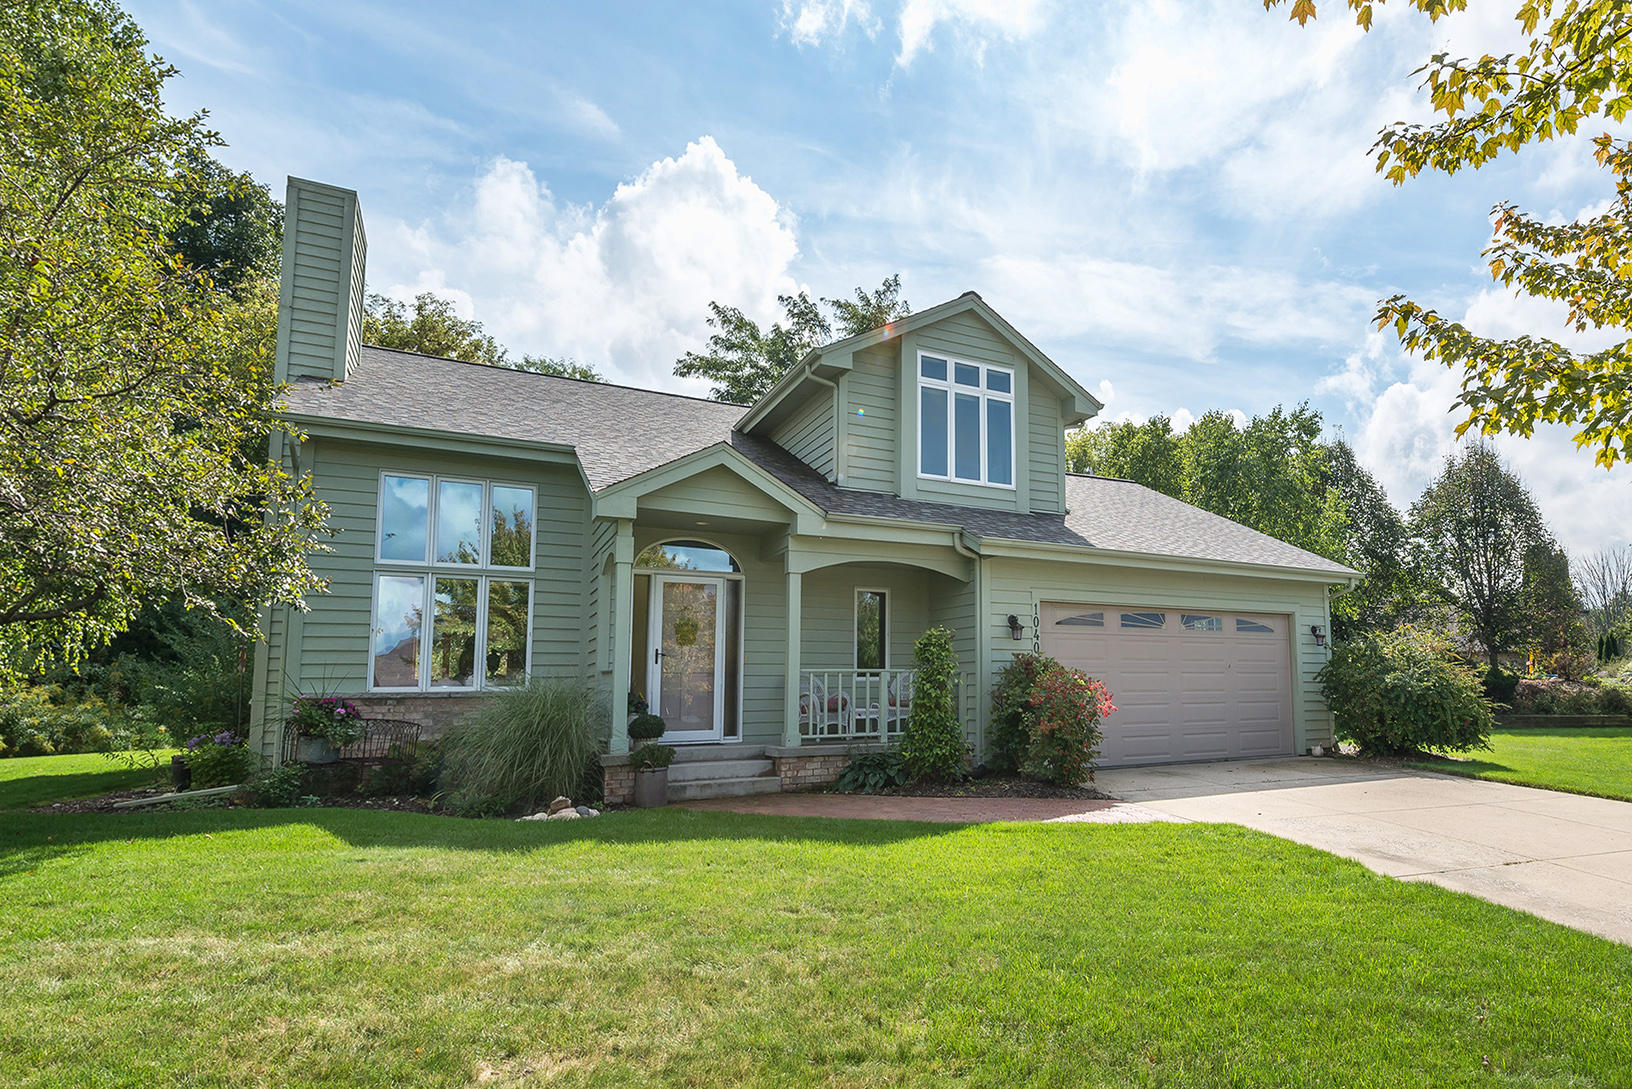 1040 Eton Ct, Hartland, Wisconsin 53029, 3 Bedrooms Bedrooms, 7 Rooms Rooms,2 BathroomsBathrooms,Single-Family,For Sale,Eton Ct,1607652